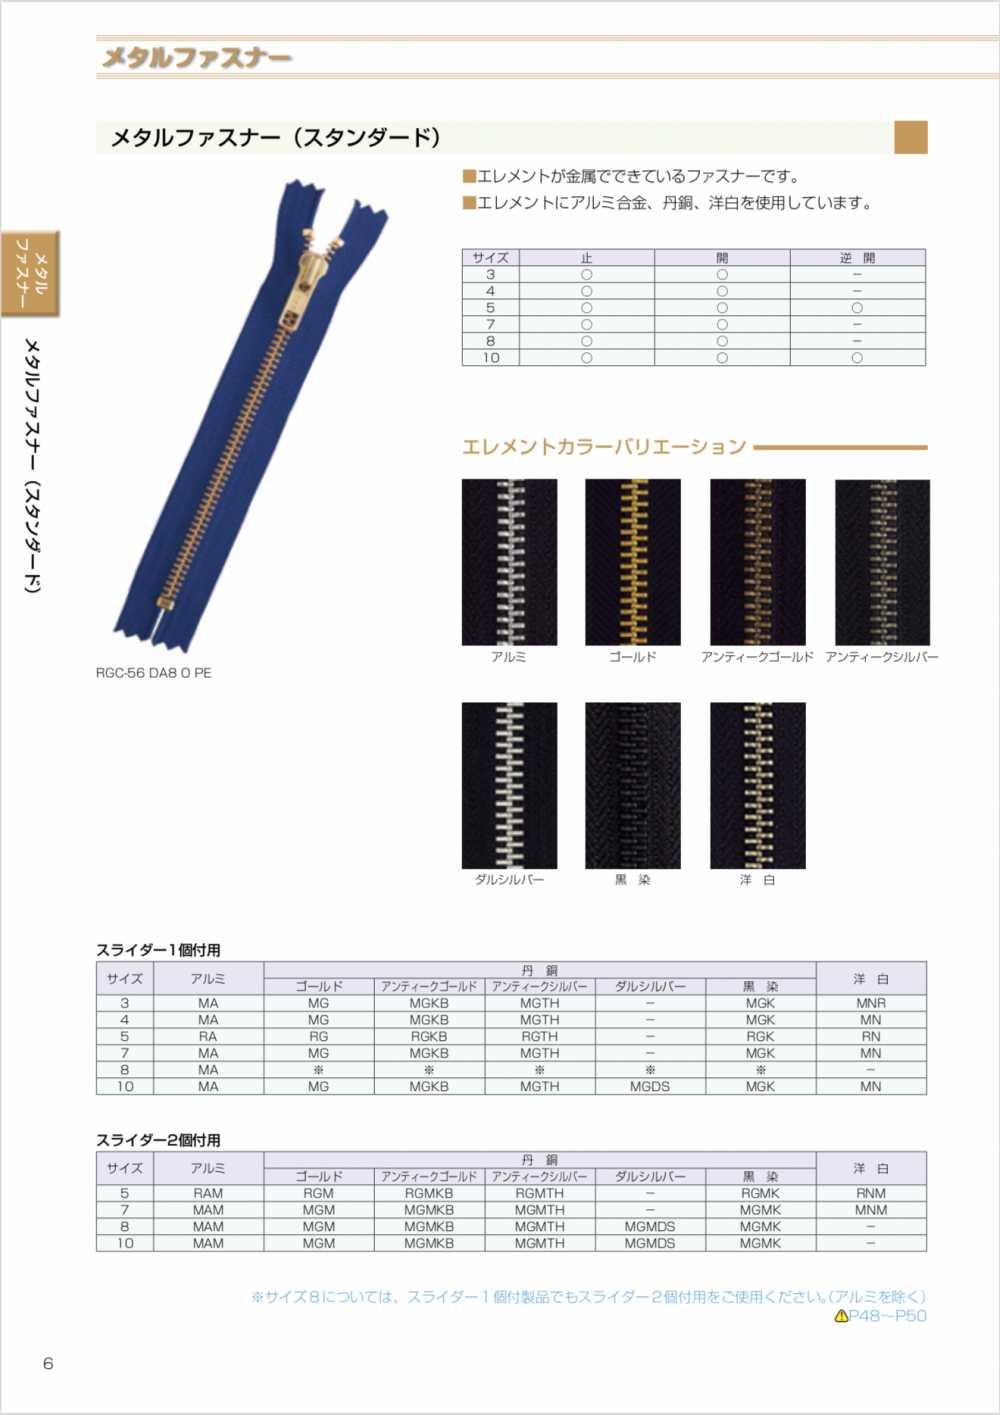 10MGKC YKKメタルファスナー 10サイズ 黒染 止め YKK/オークラ商事 - ApparelX アパレル資材卸通販